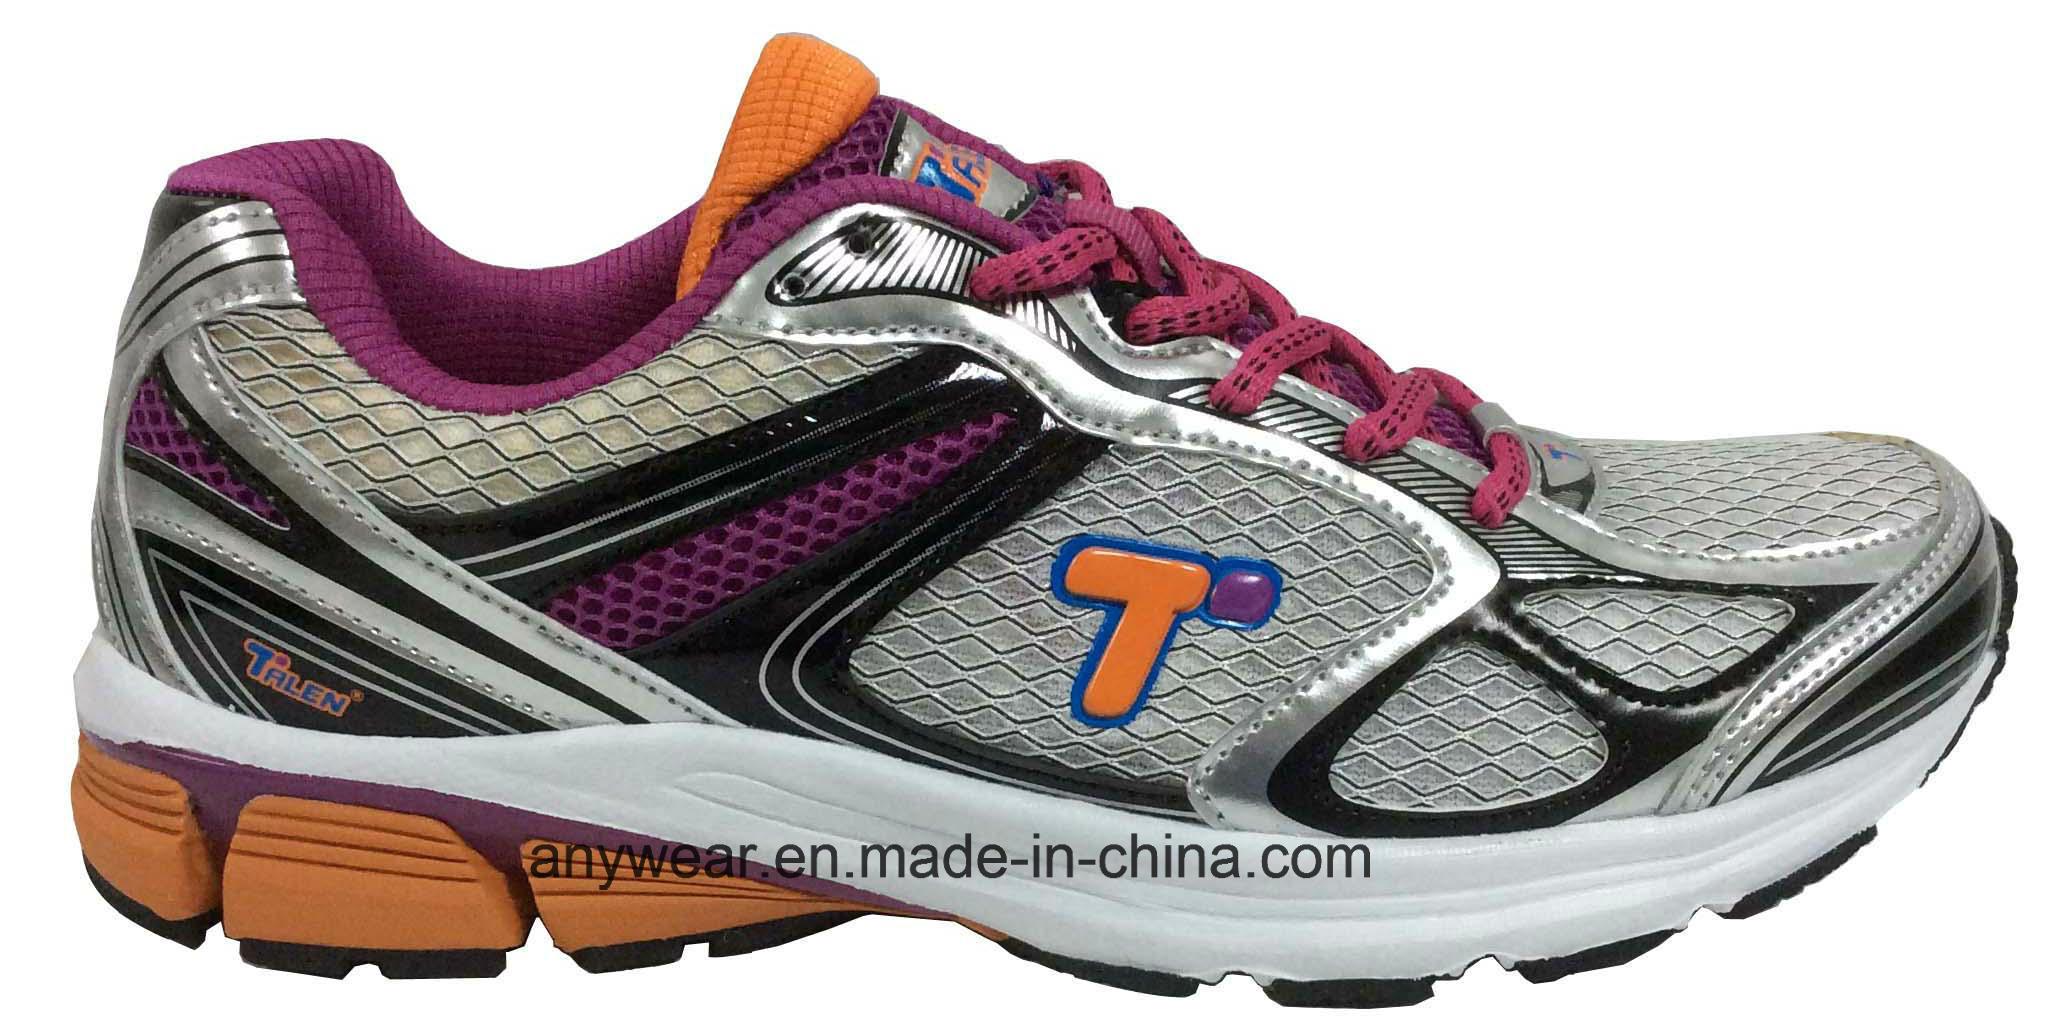 Athletic Men Footwear Gym Sports Shoes (815-3108)